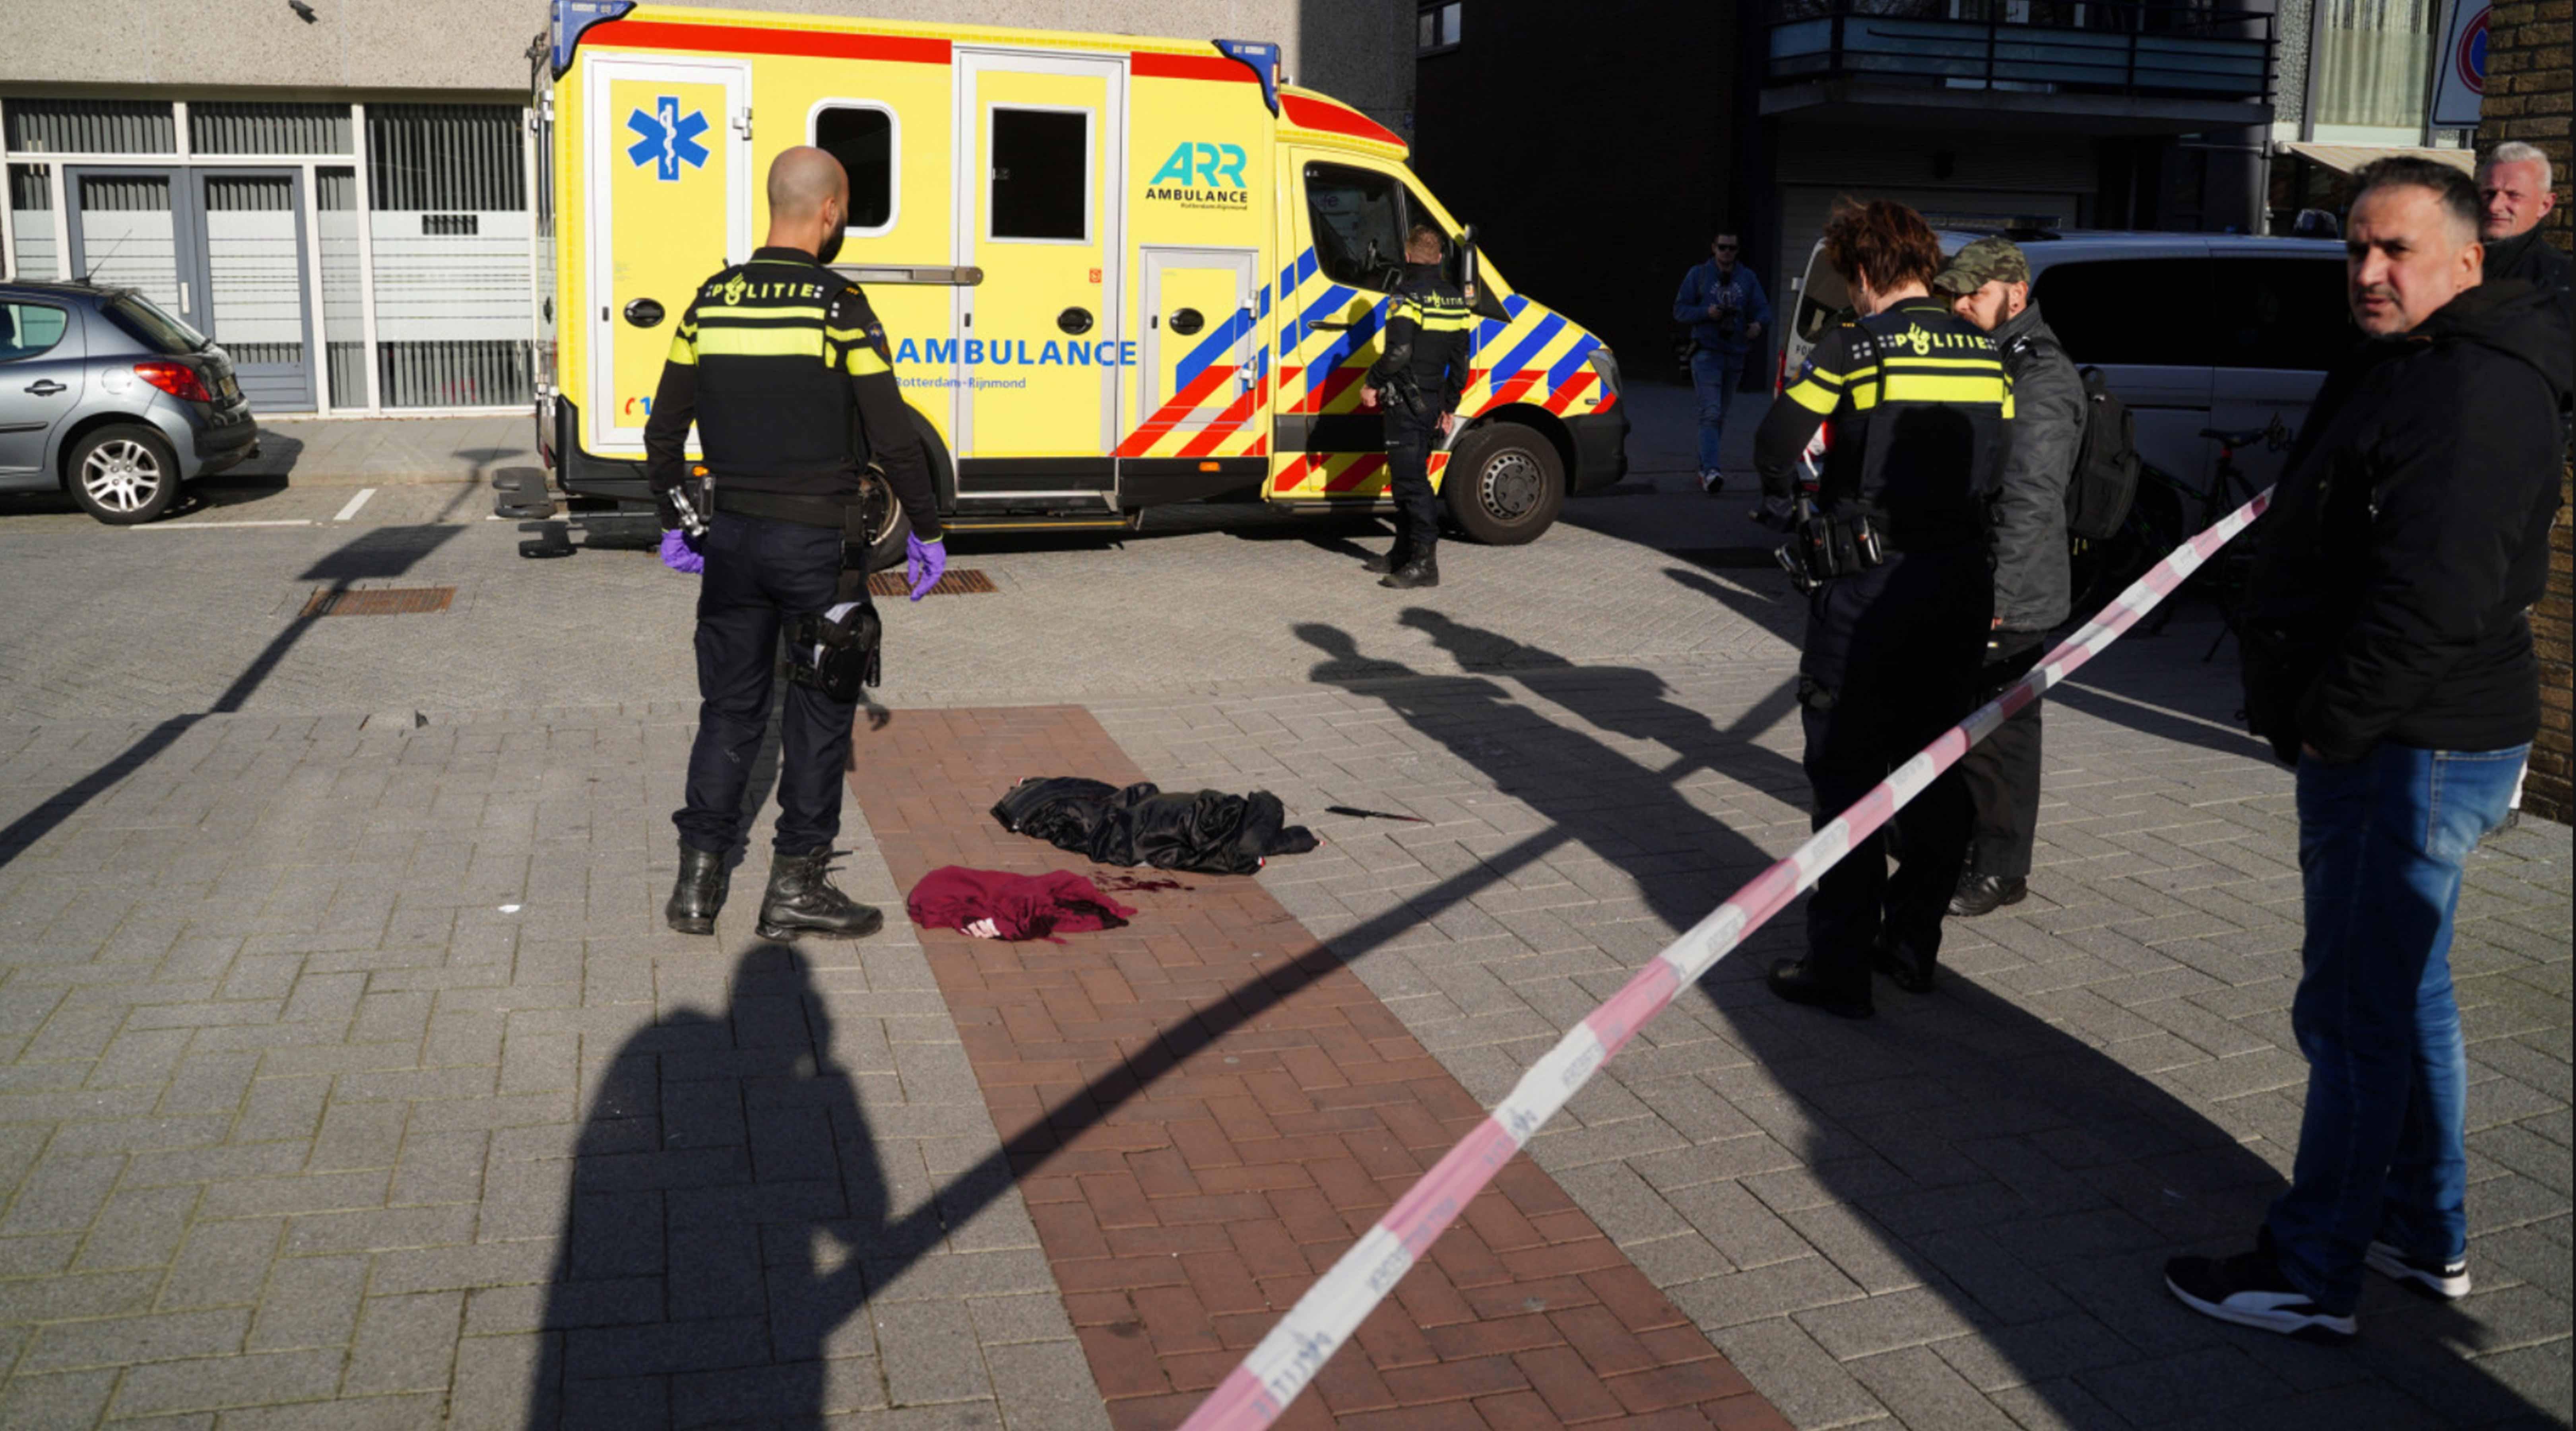 Man zwaargewond na steekpartij in Rinze Koopmansstraat